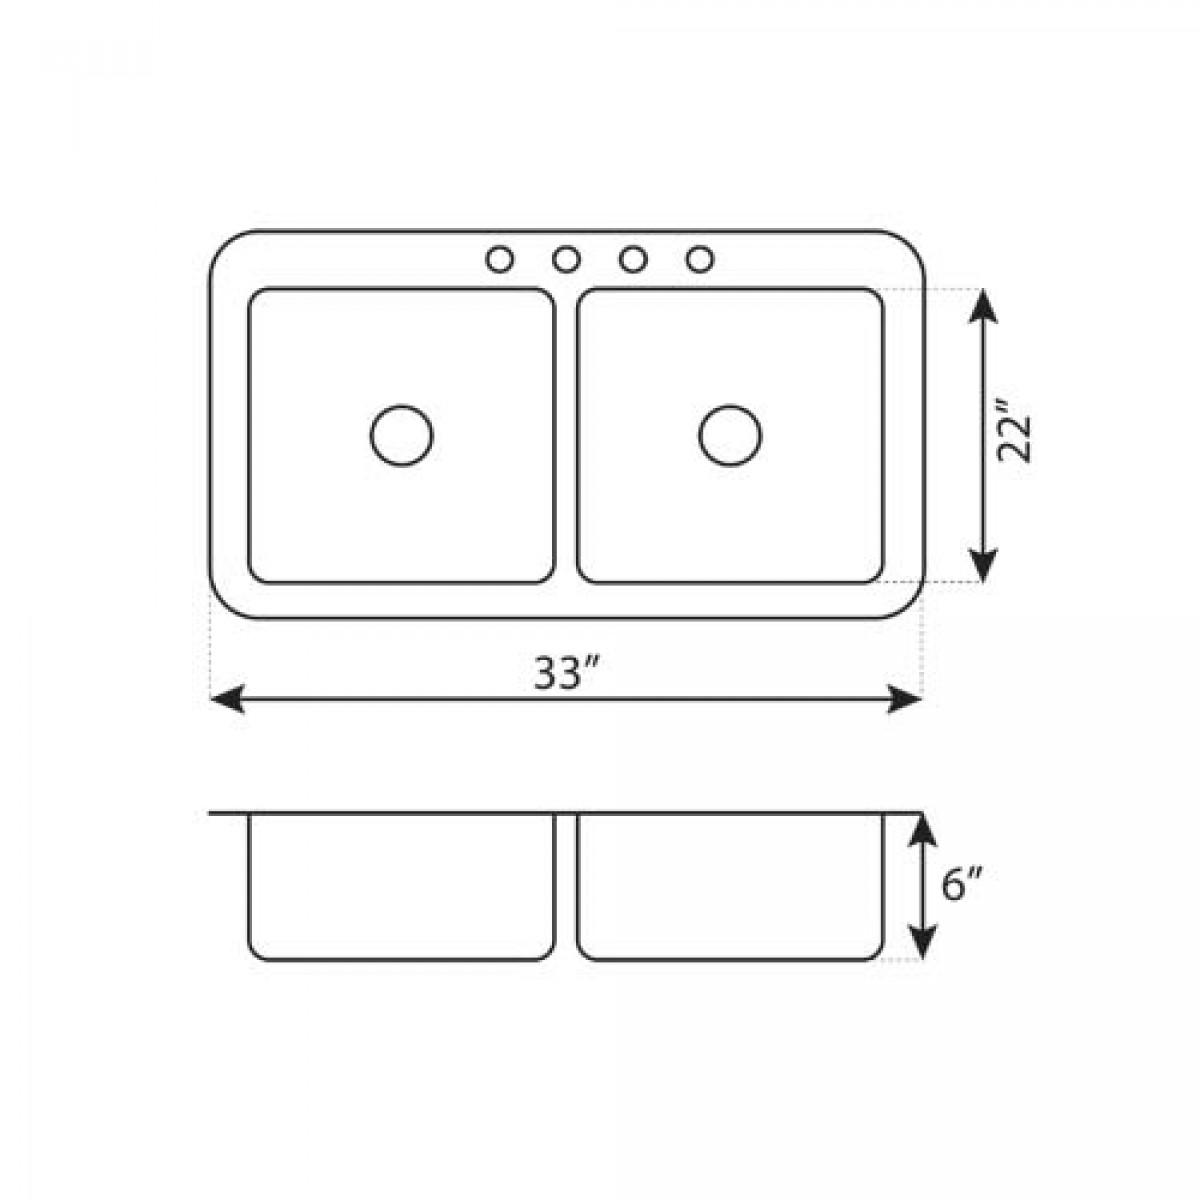 Top Mount Stainless Steel Double Basin Kitchen Sink Model